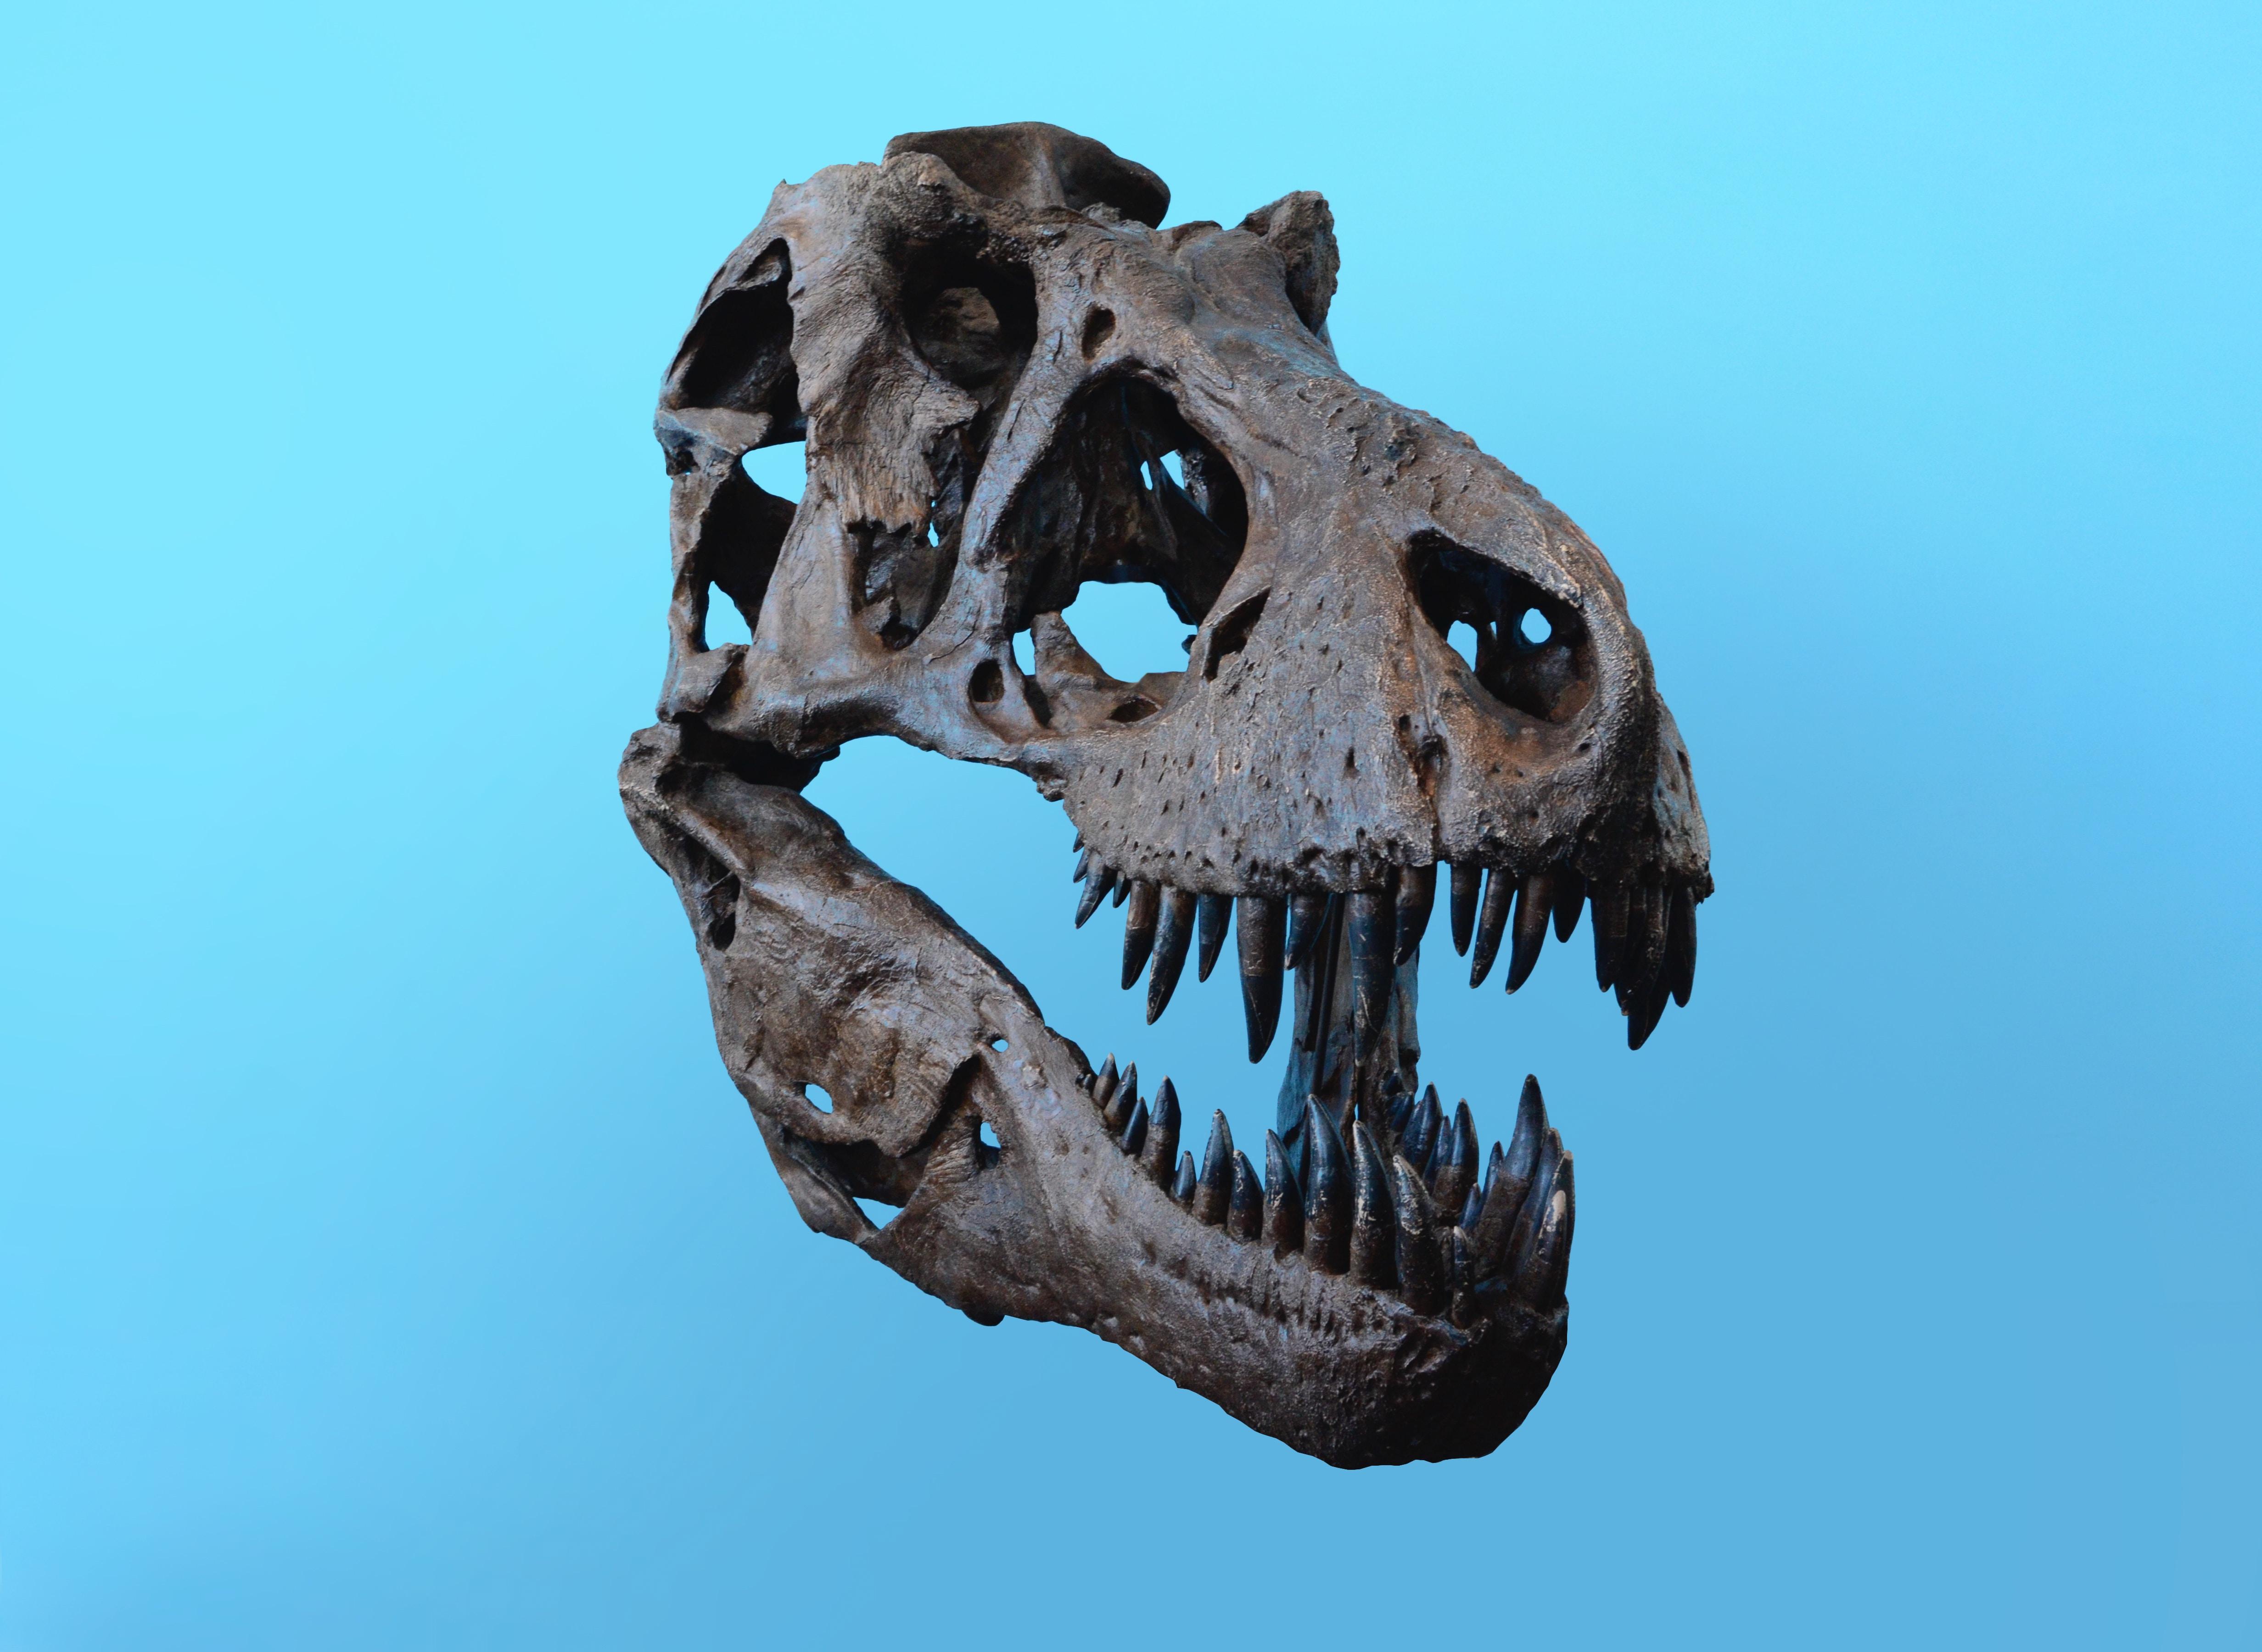 dinosaurus, dinosaur, fund, ny art. (Foto: Unsplash)